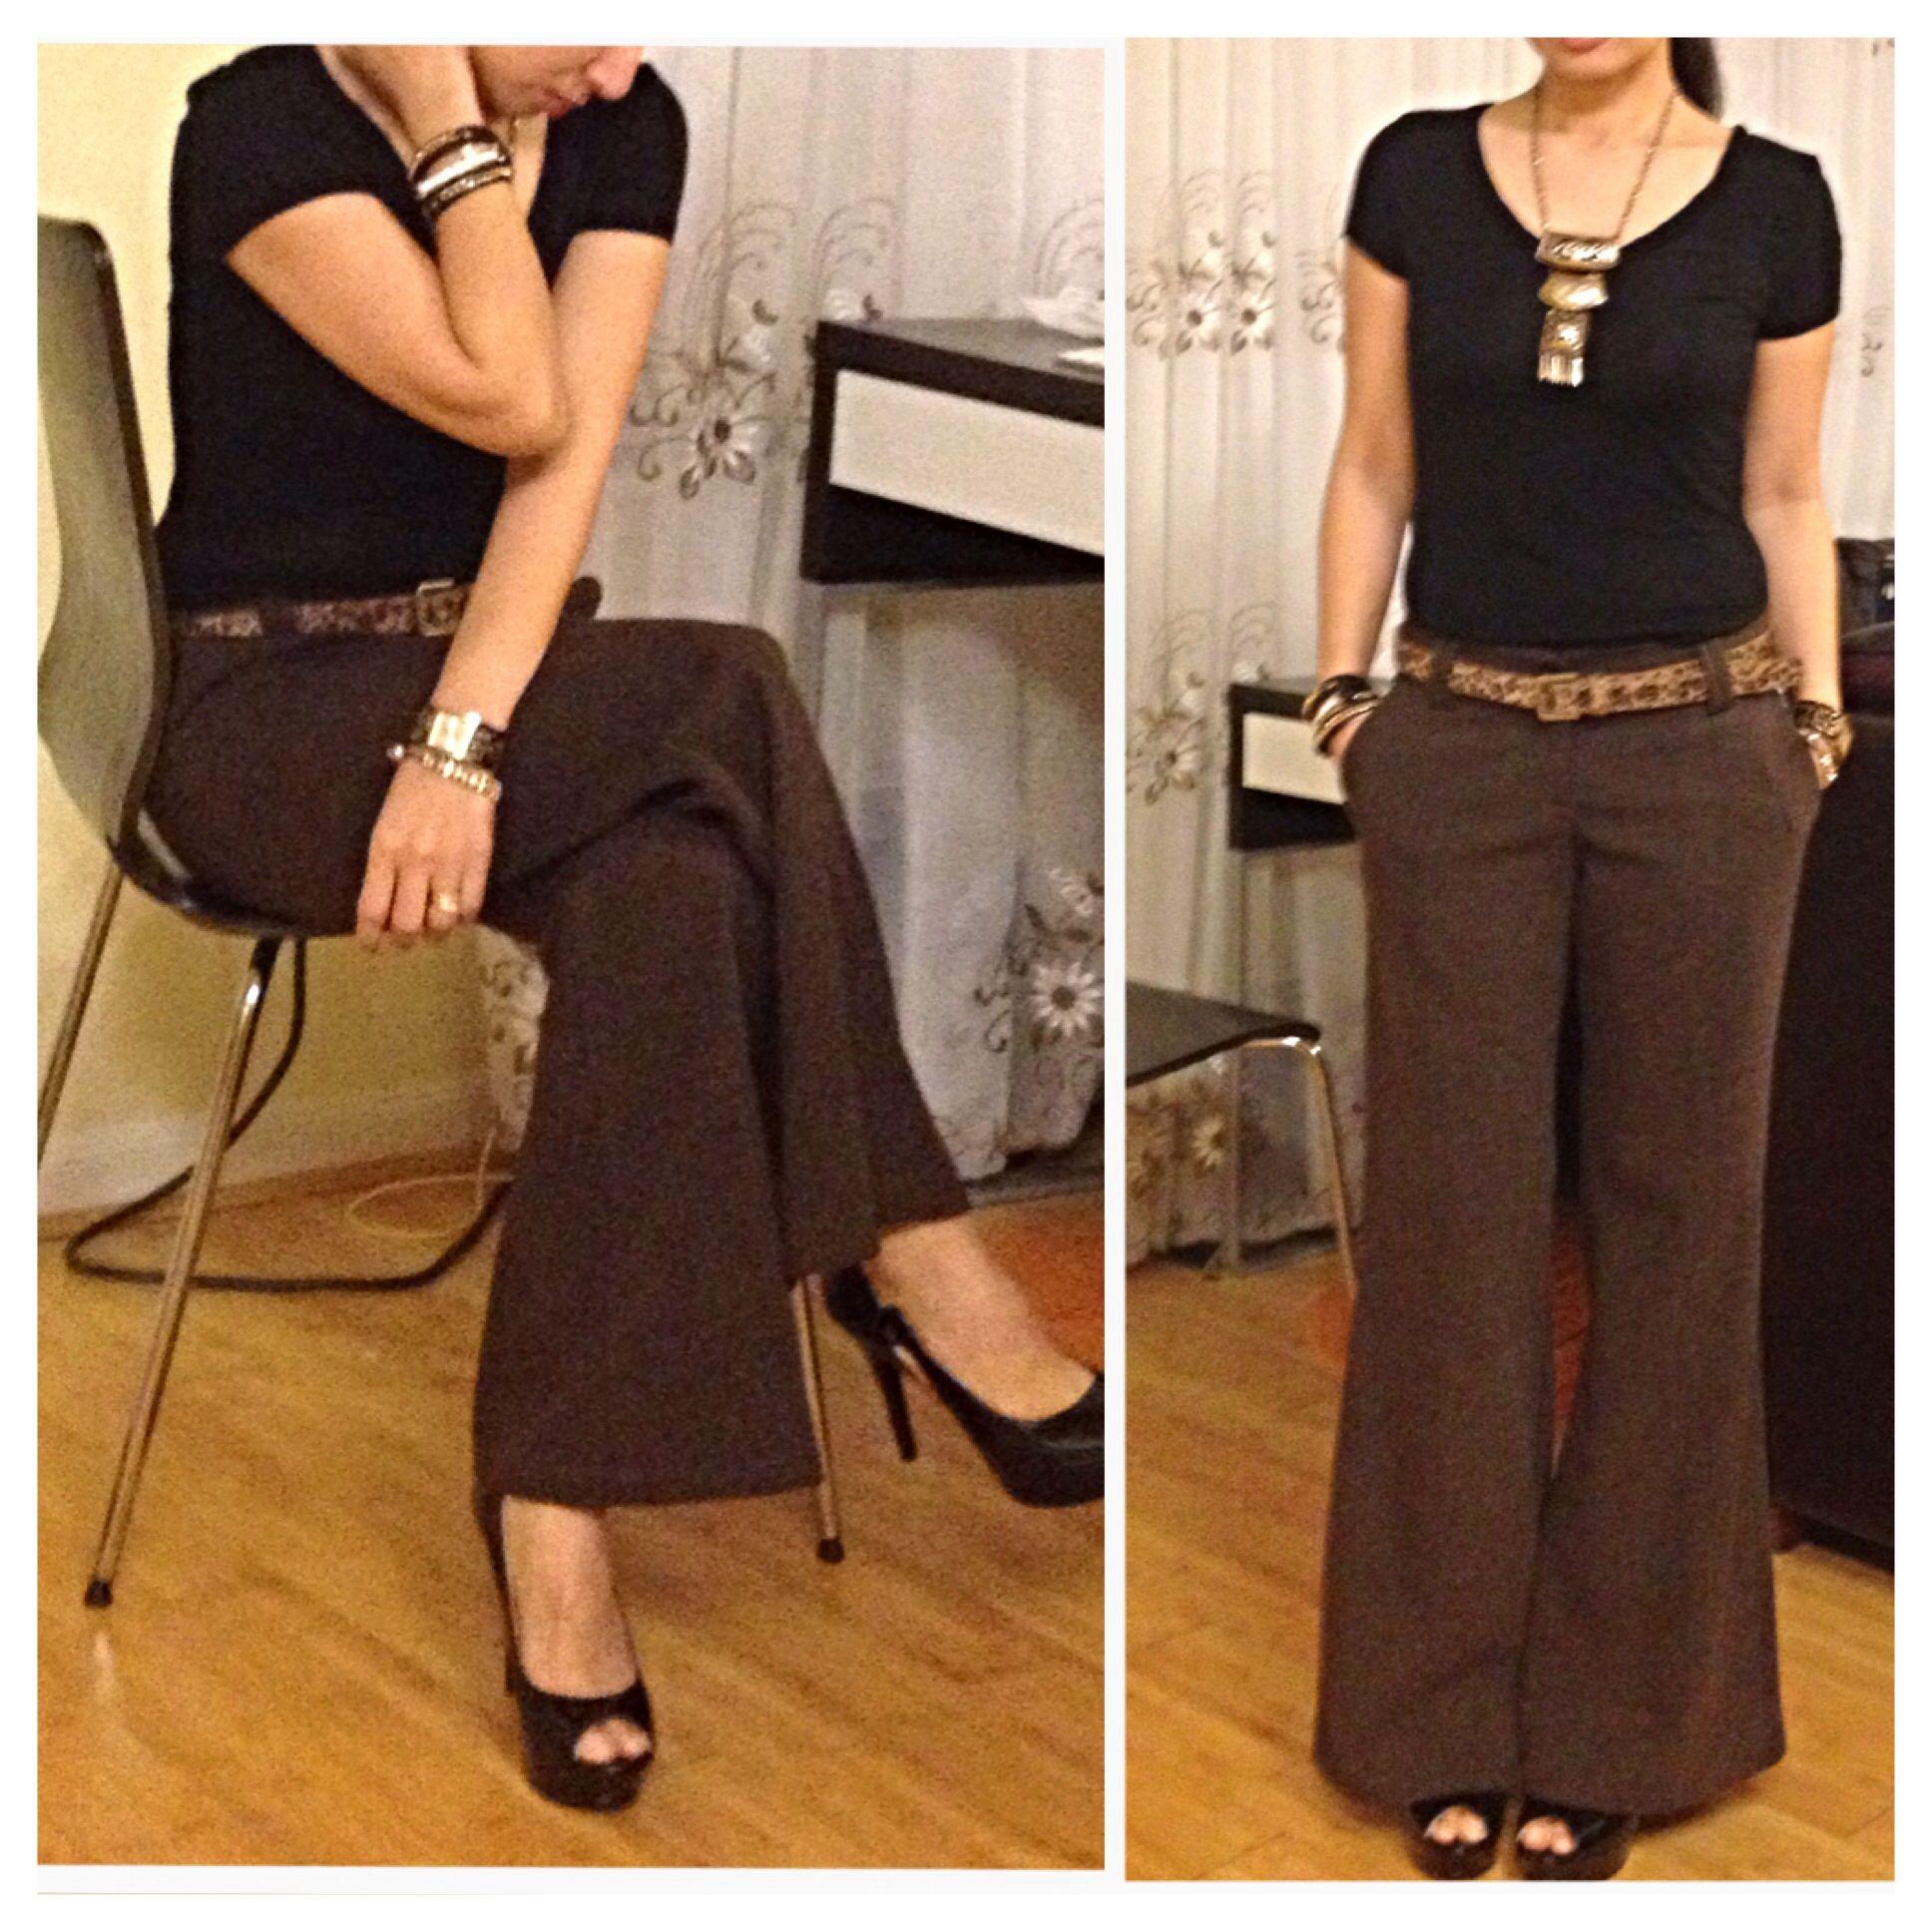 day 96: plain black v-neck shirt on brown dress pants; accessorize ...